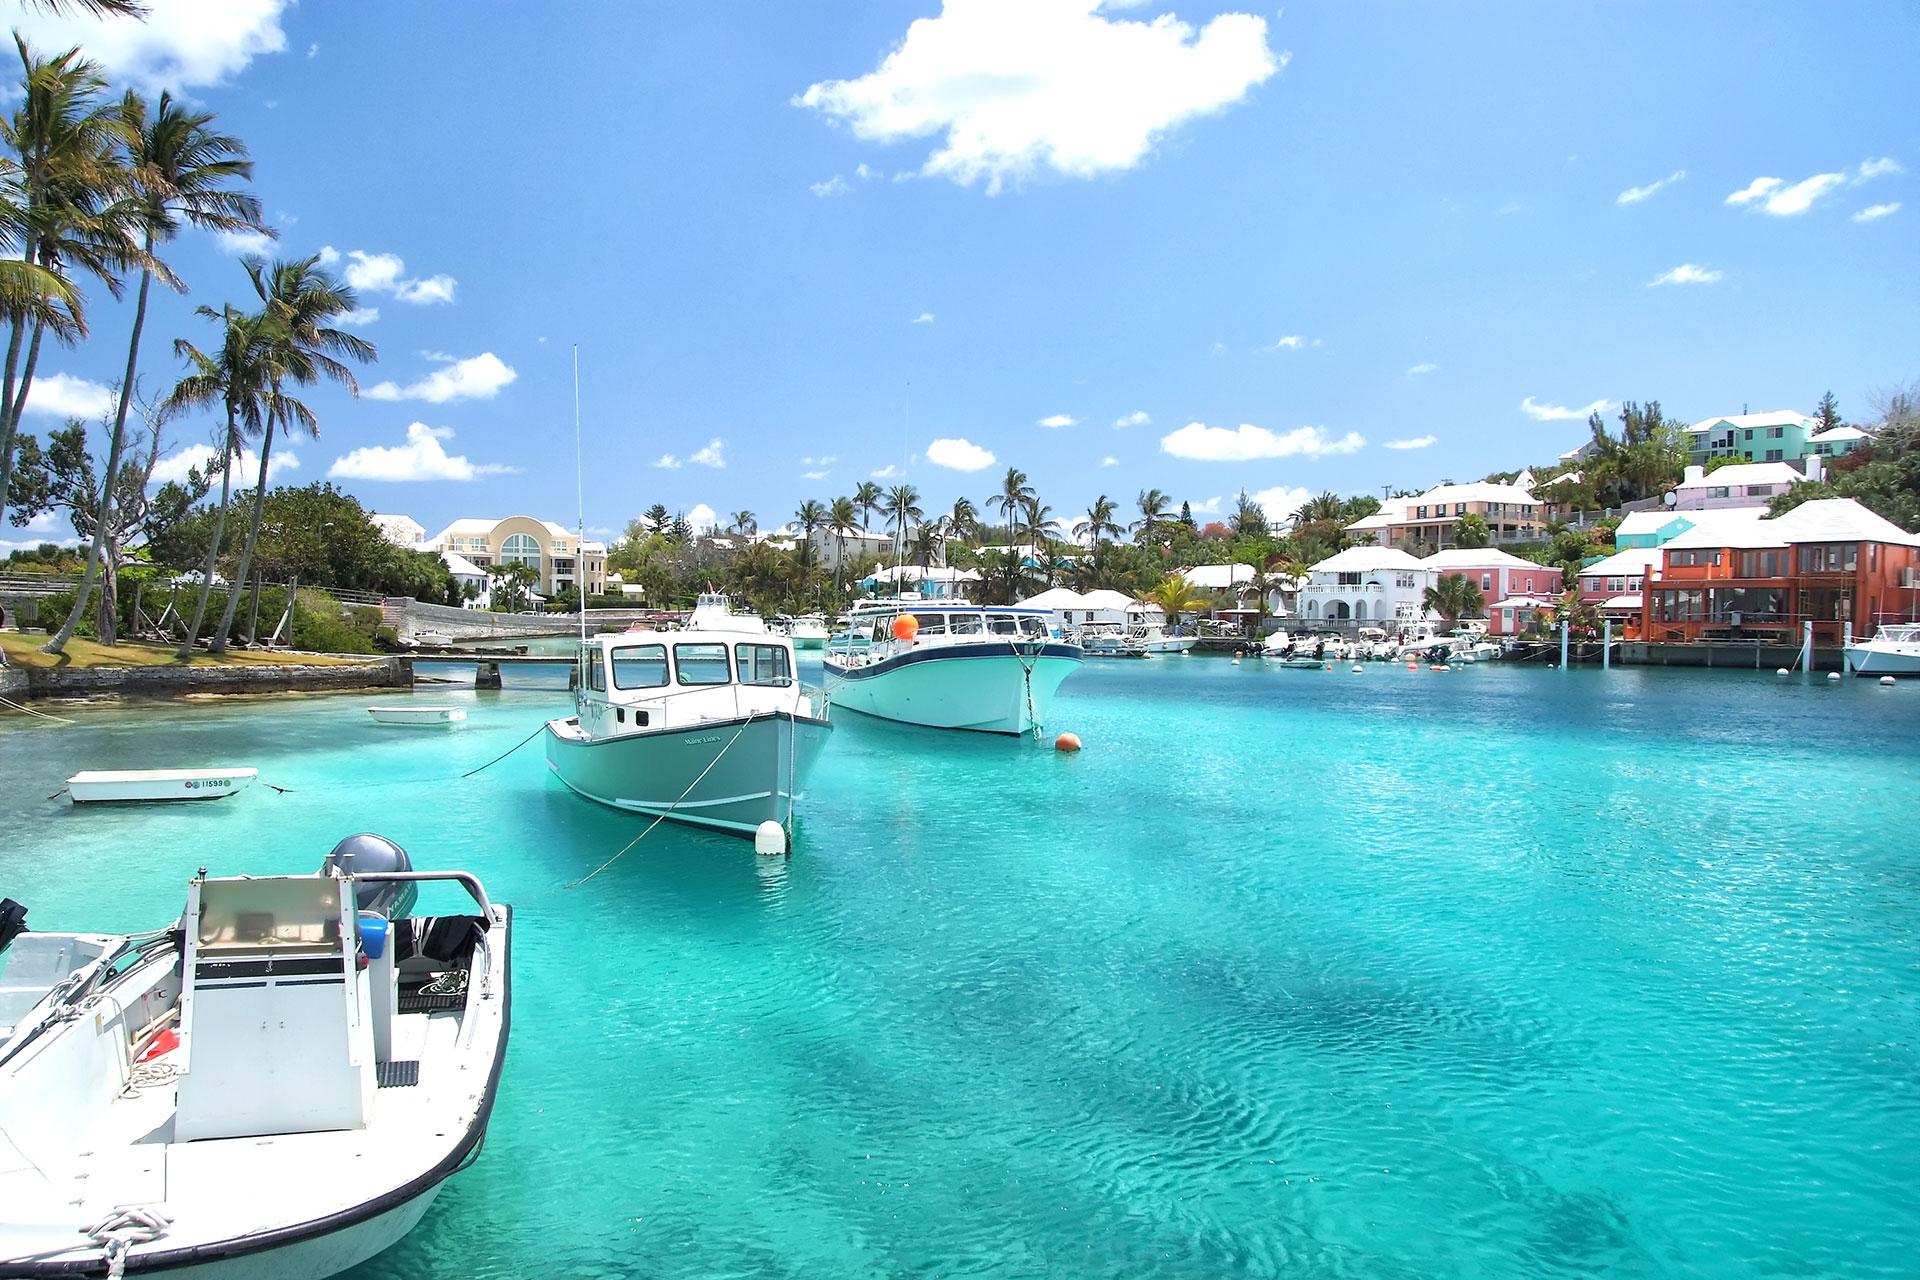 Bermuda; Courtesy of Just dance/Shutterstock.com